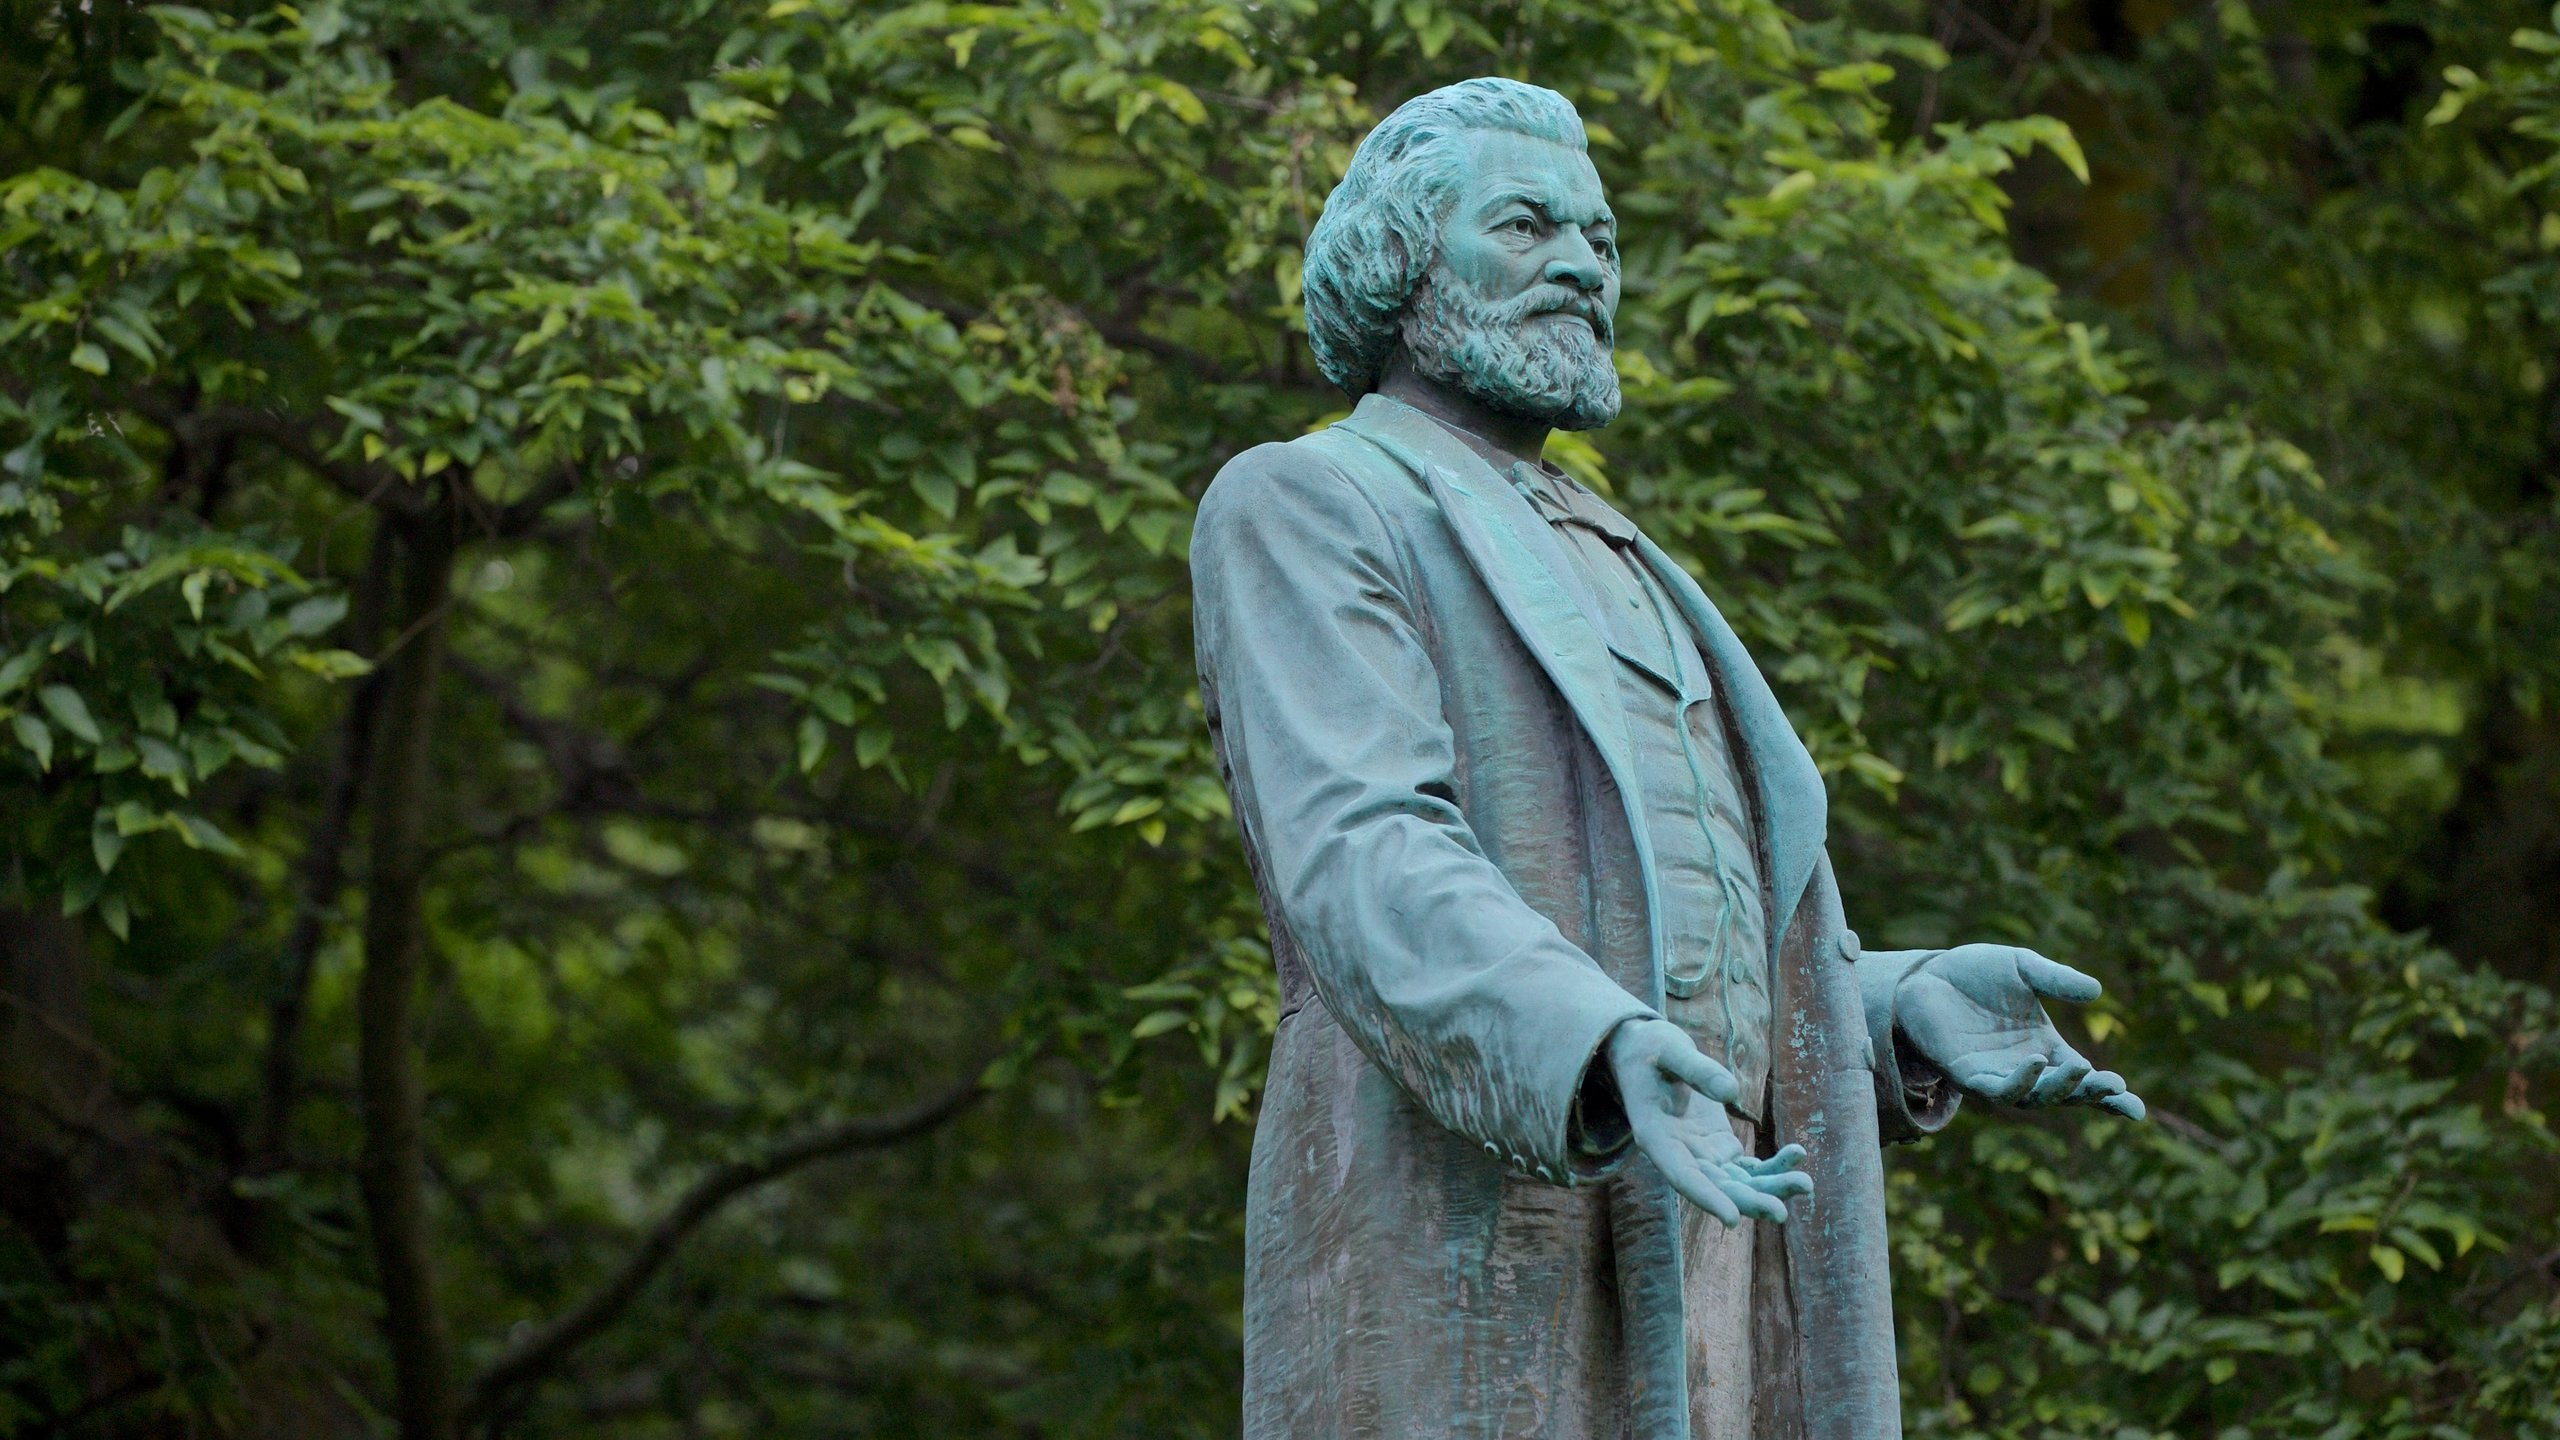 Frederick Douglass Statue, Rochester, New York, United States of America